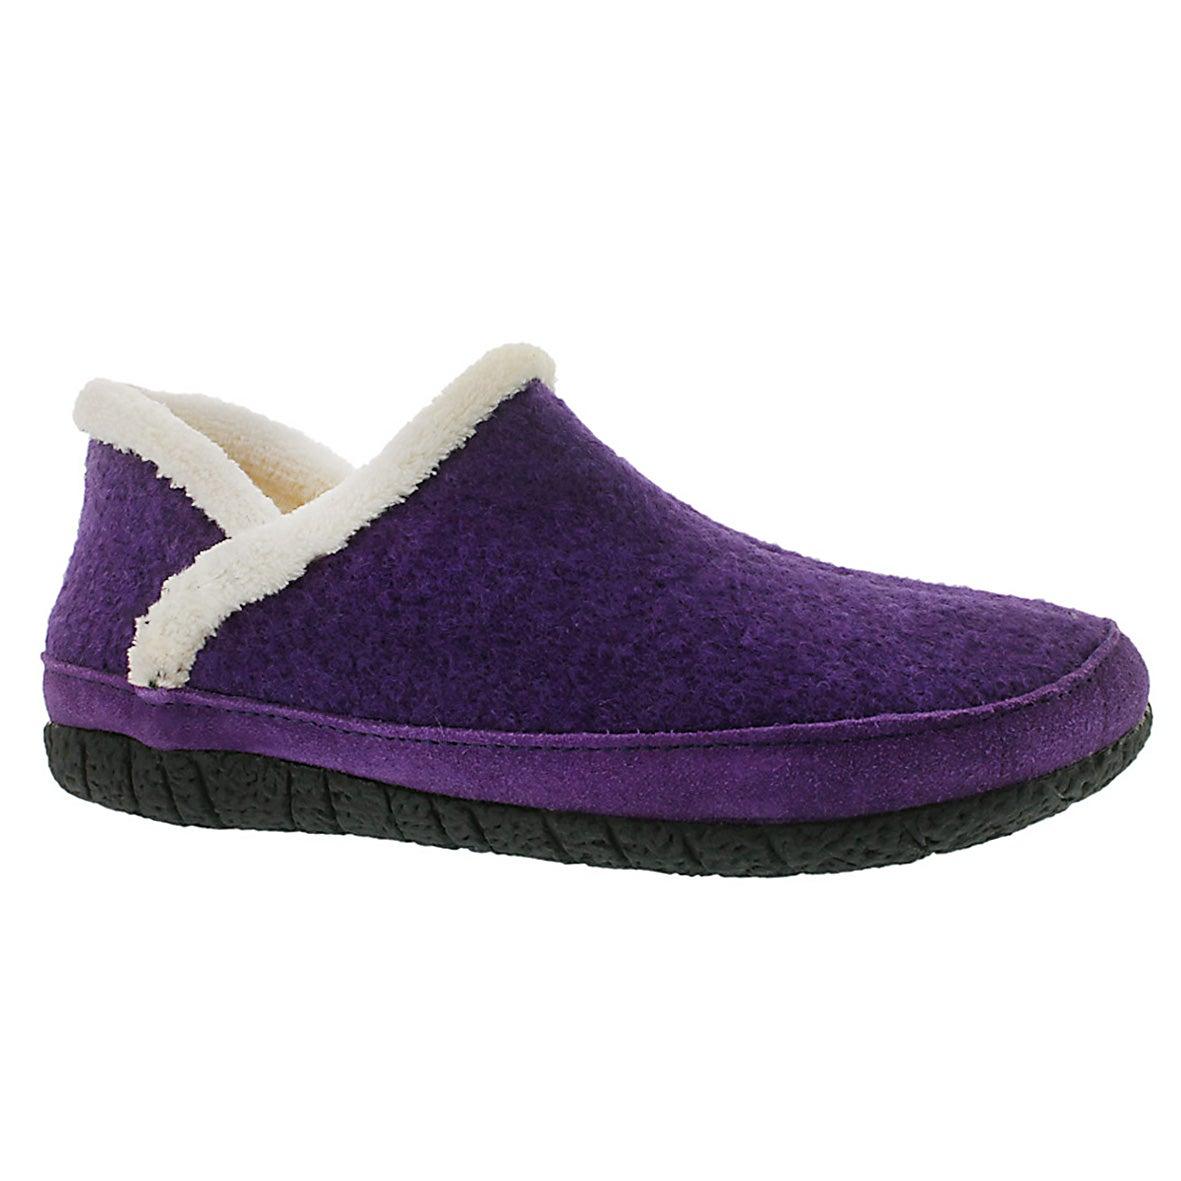 Lds Raglan purple micro suede slipper